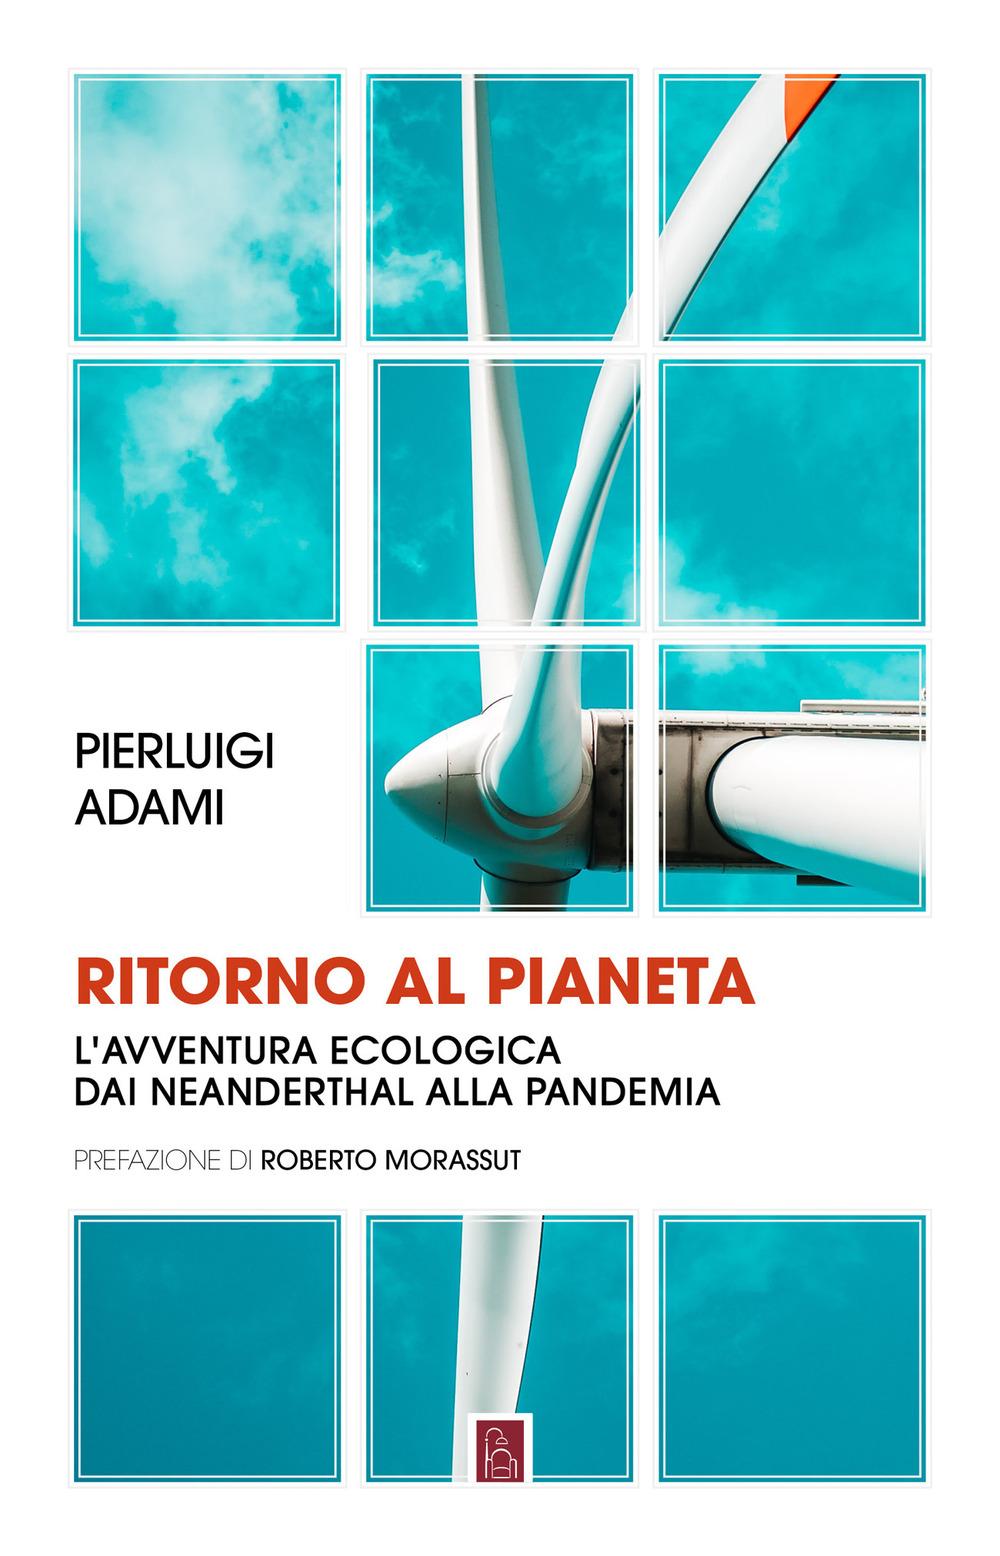 RITORNO AL PIANETA - Adami Pierluigi - 9791259630728